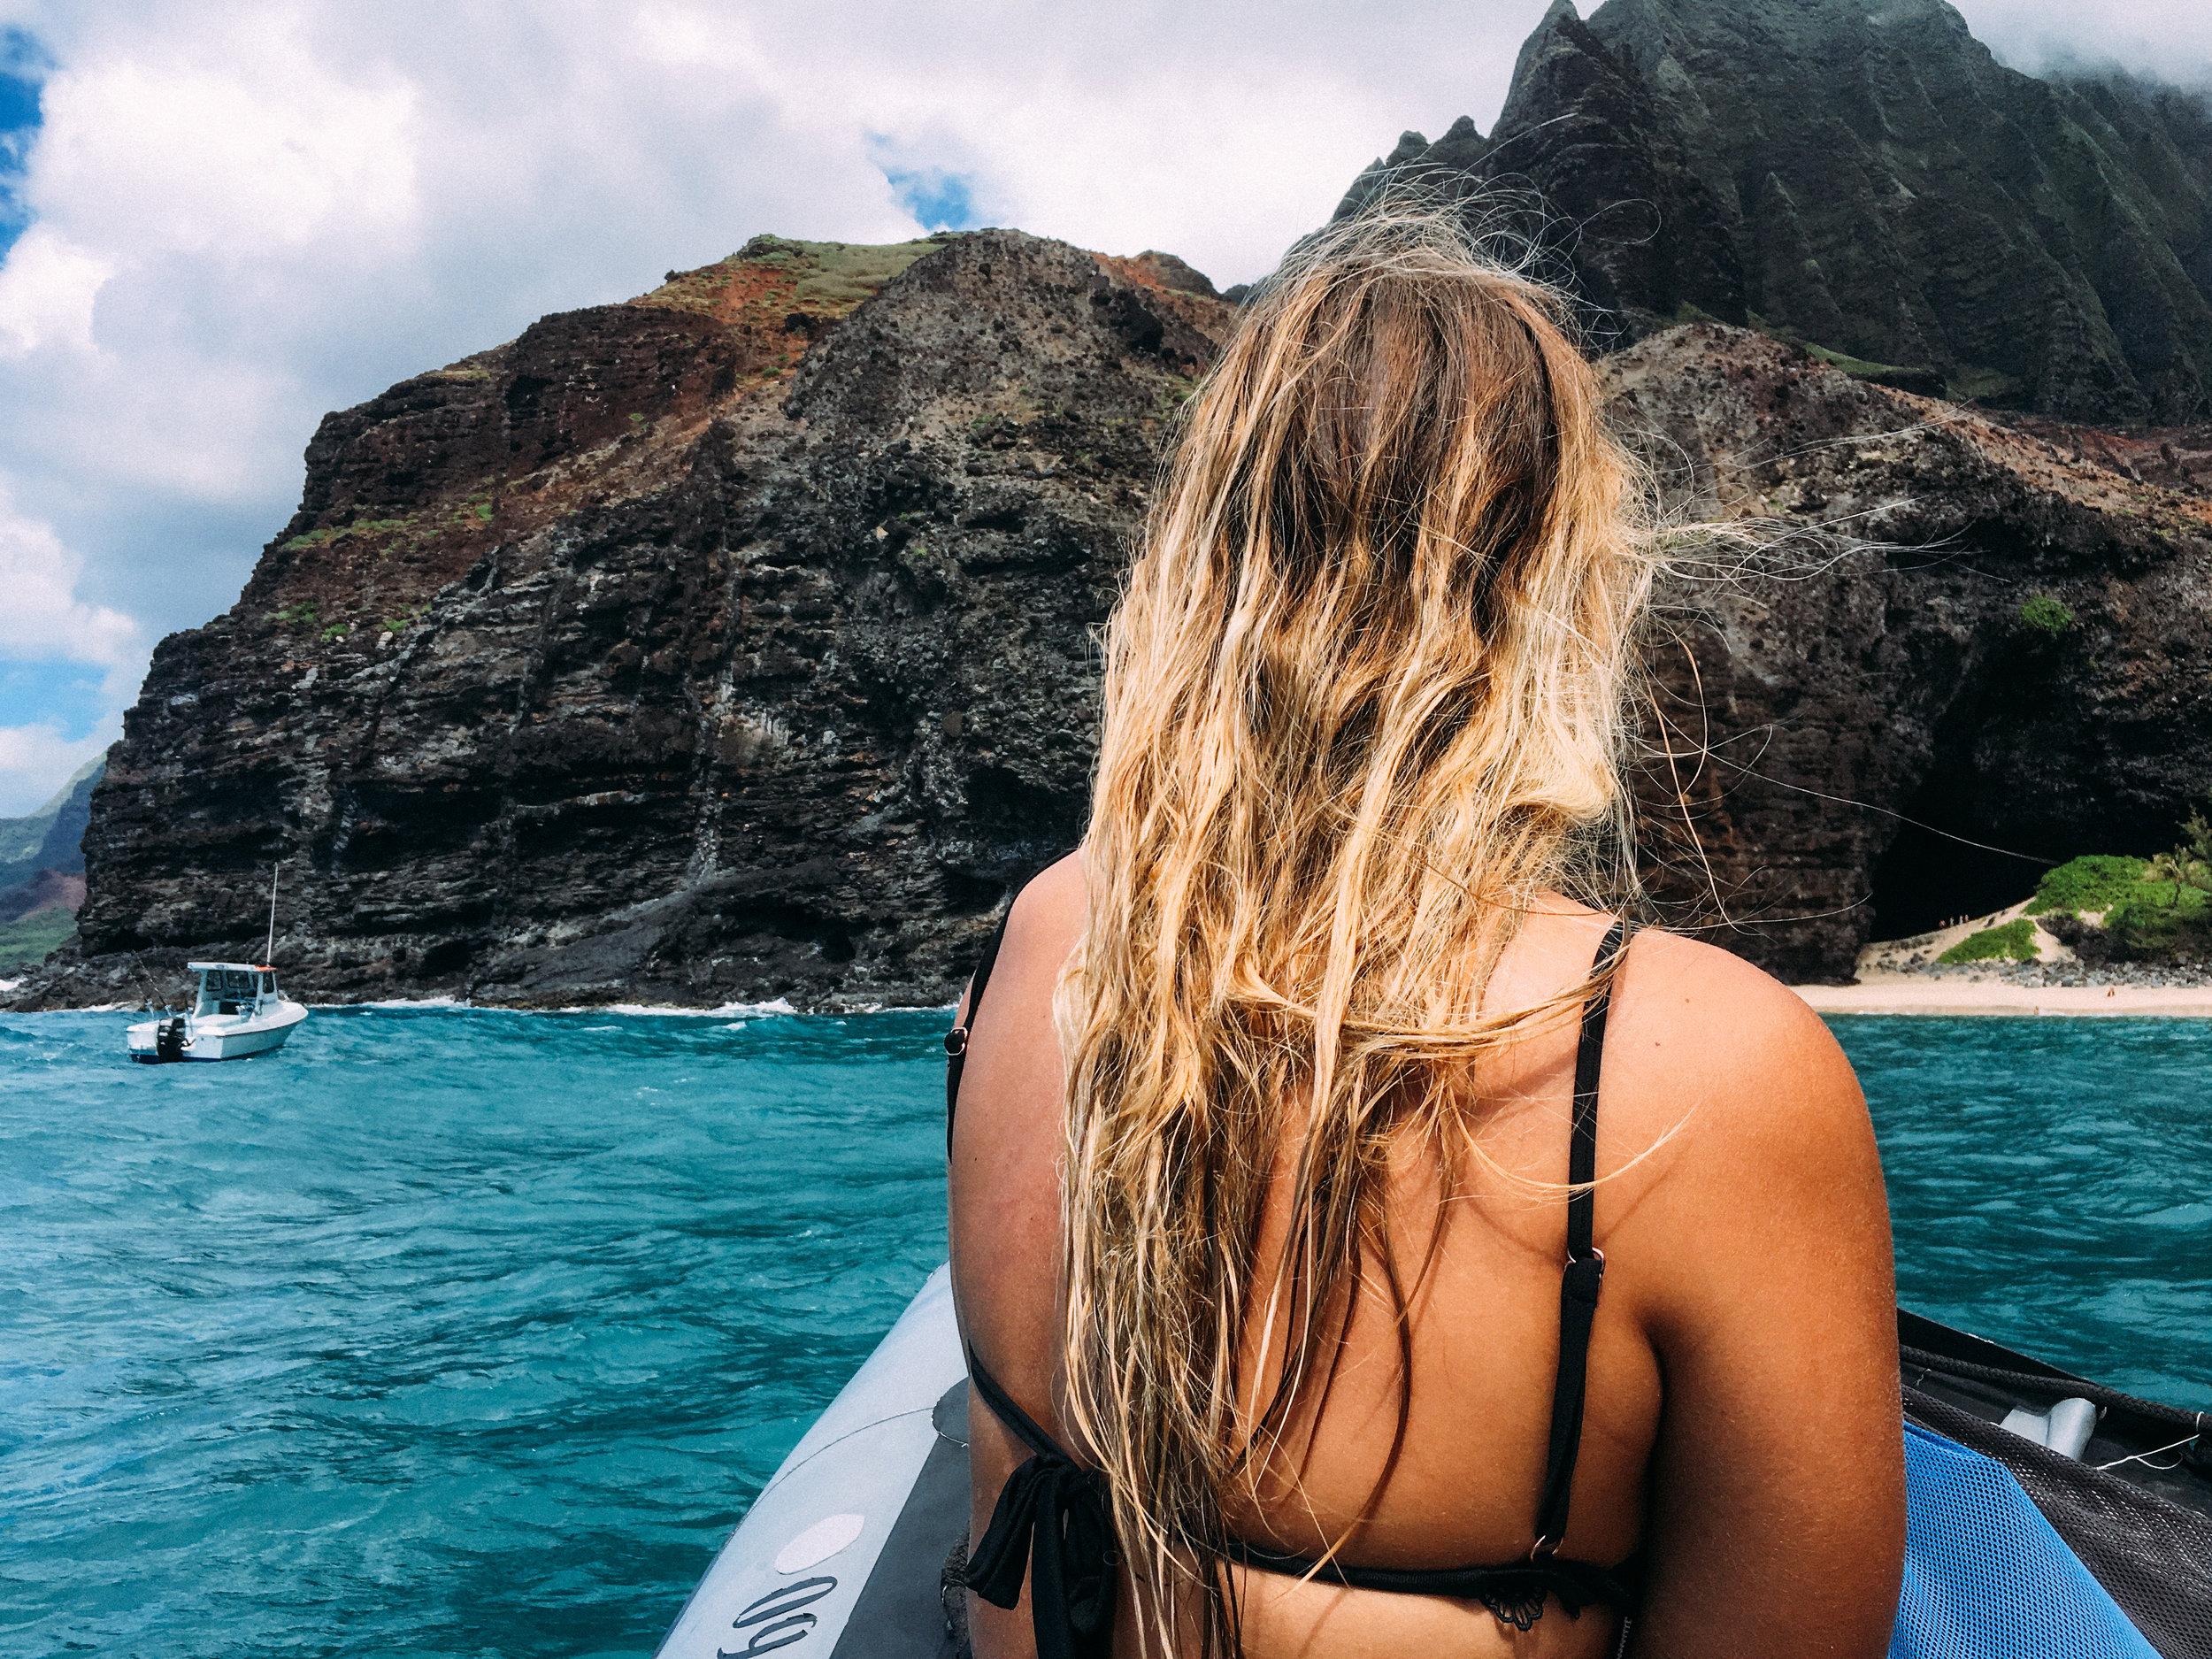 Na Pali Coast, Blue Ocean Adventures, Blue Ocean Adventure Tour, Boat Tour, Na Pali Boat Tour, SaltWaterVibes, Kauai, Hawaii Adventures